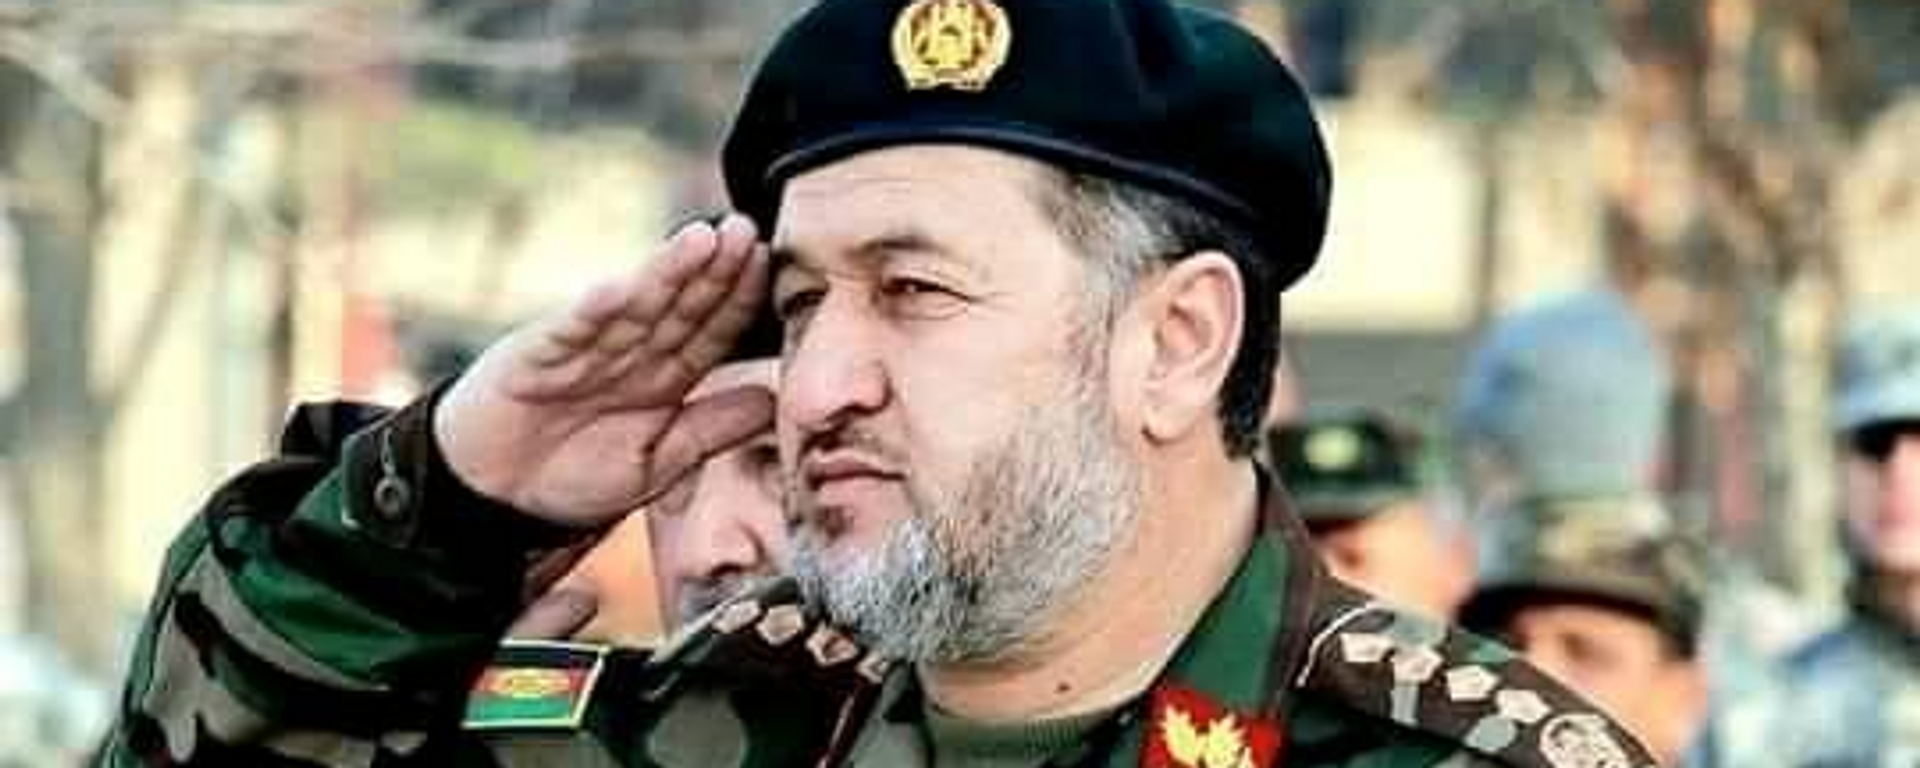 Глава Министерство обороны Афганистана Бисмиллахан Мухаммади - Sputnik Таджикистан, 1920, 19.06.2021